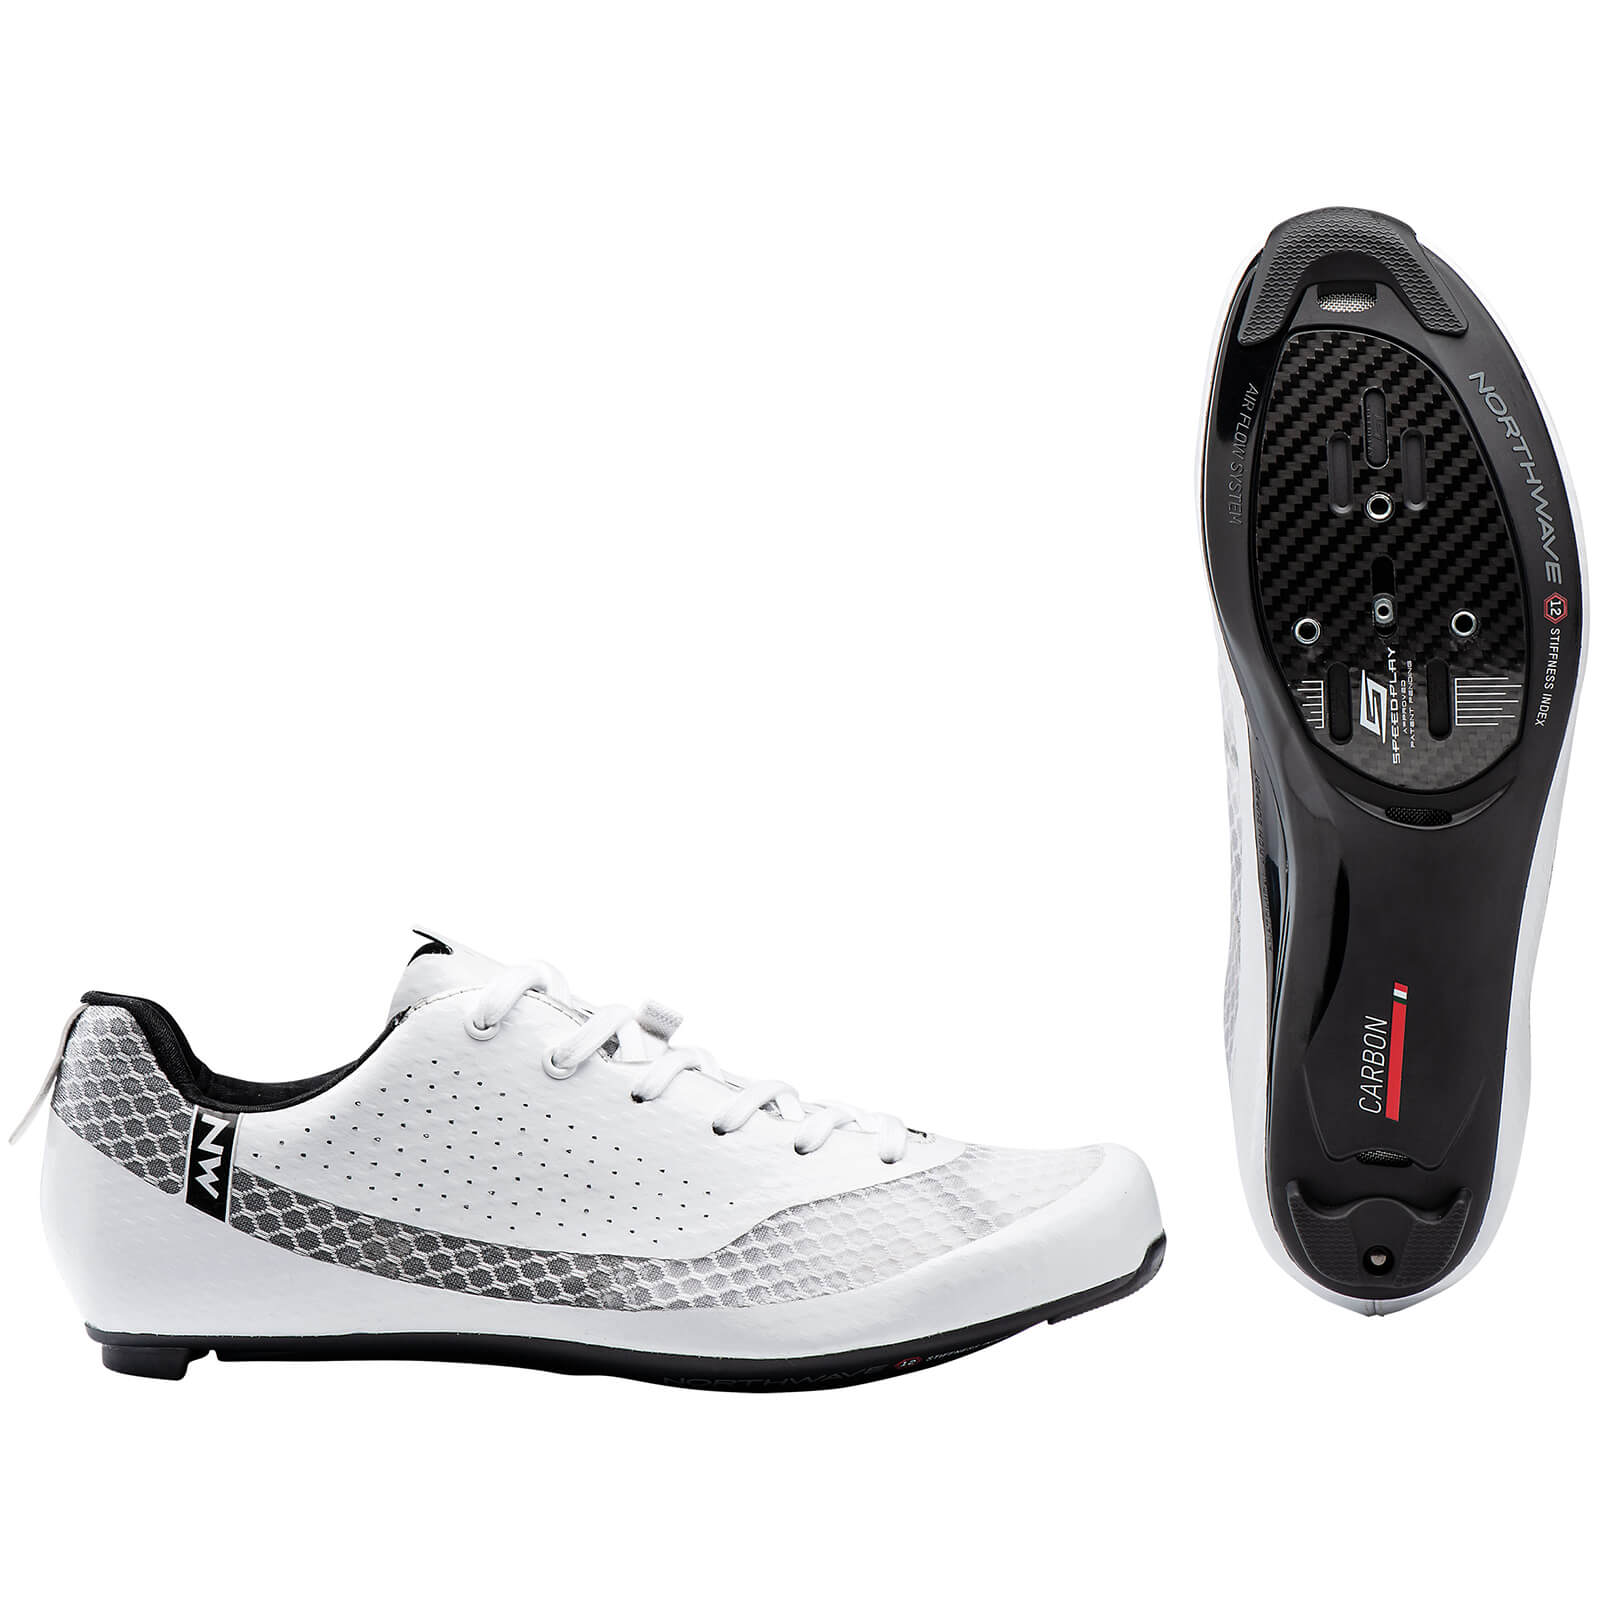 Northwave Mistral Plus Road Shoes - EU44 - Weiß